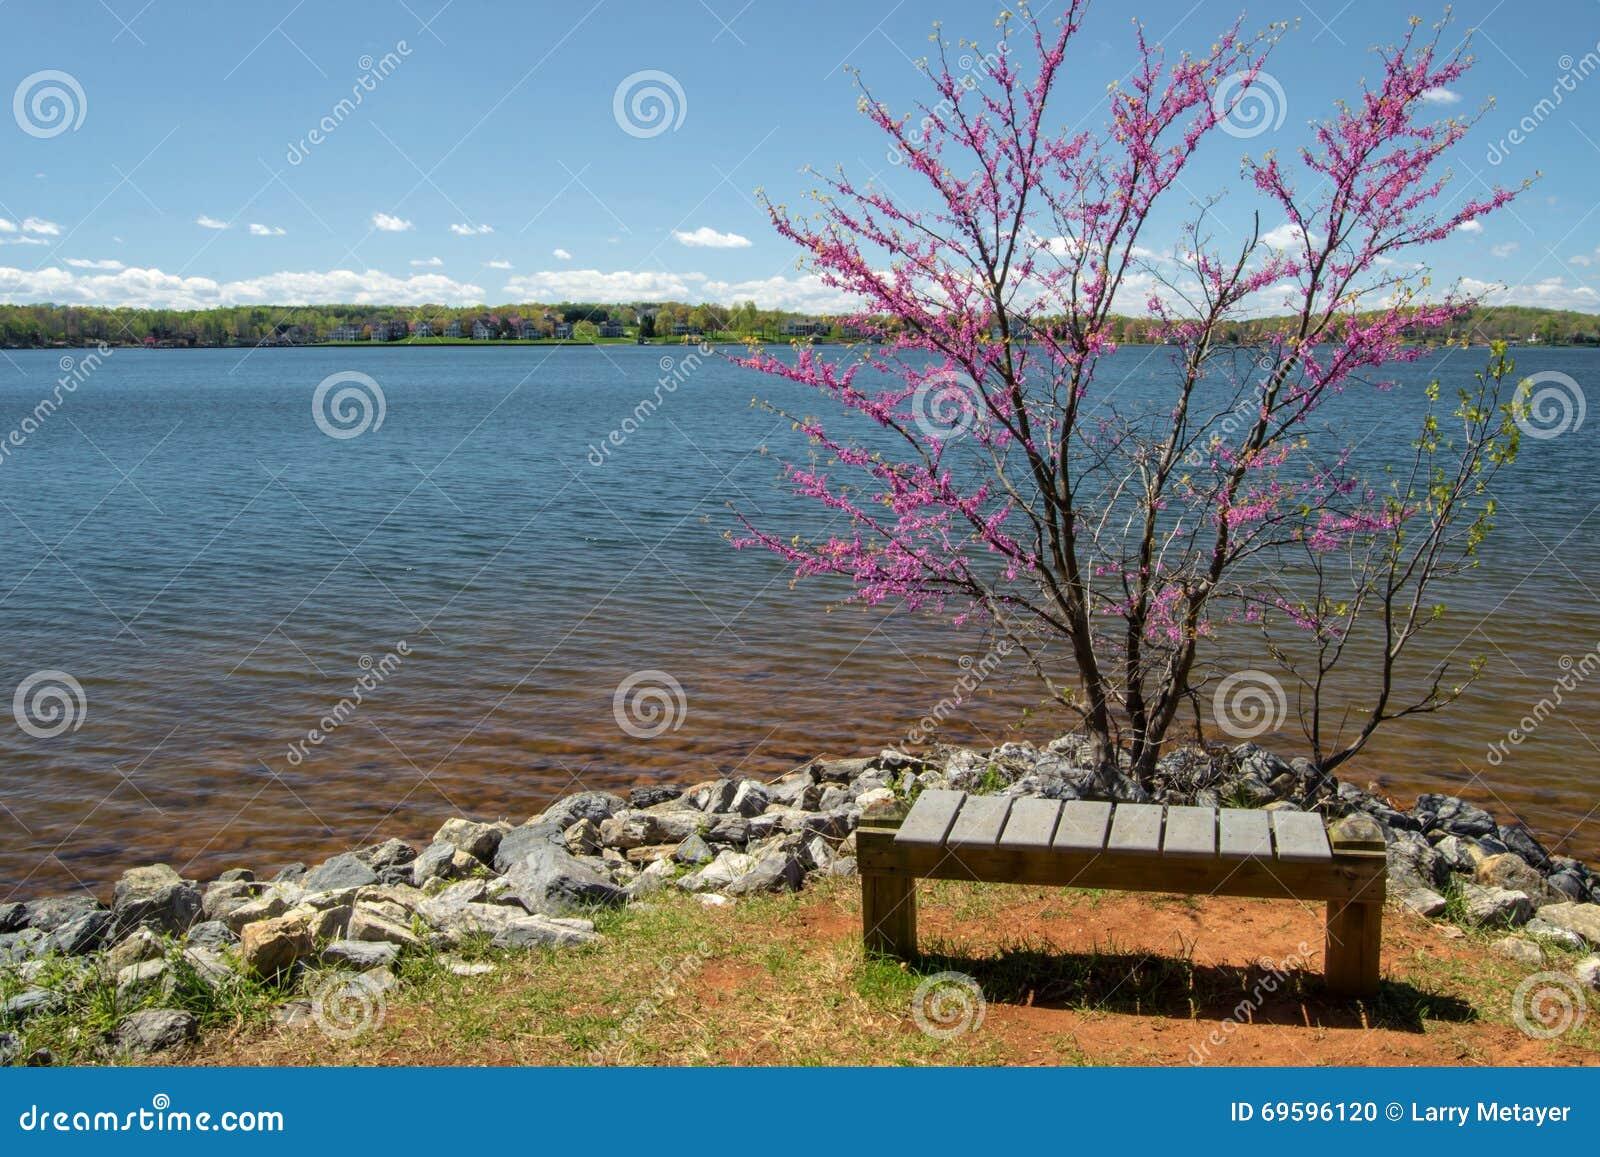 Redbud Tree, Bench and Lake